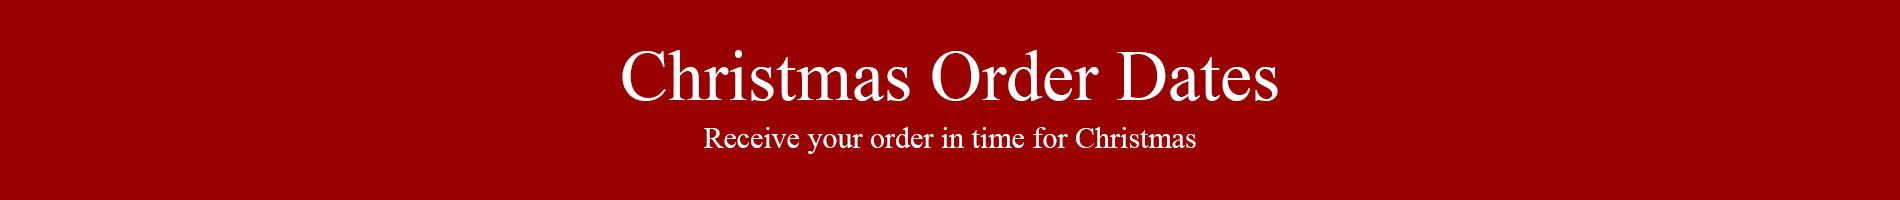 Christmas Order Dates